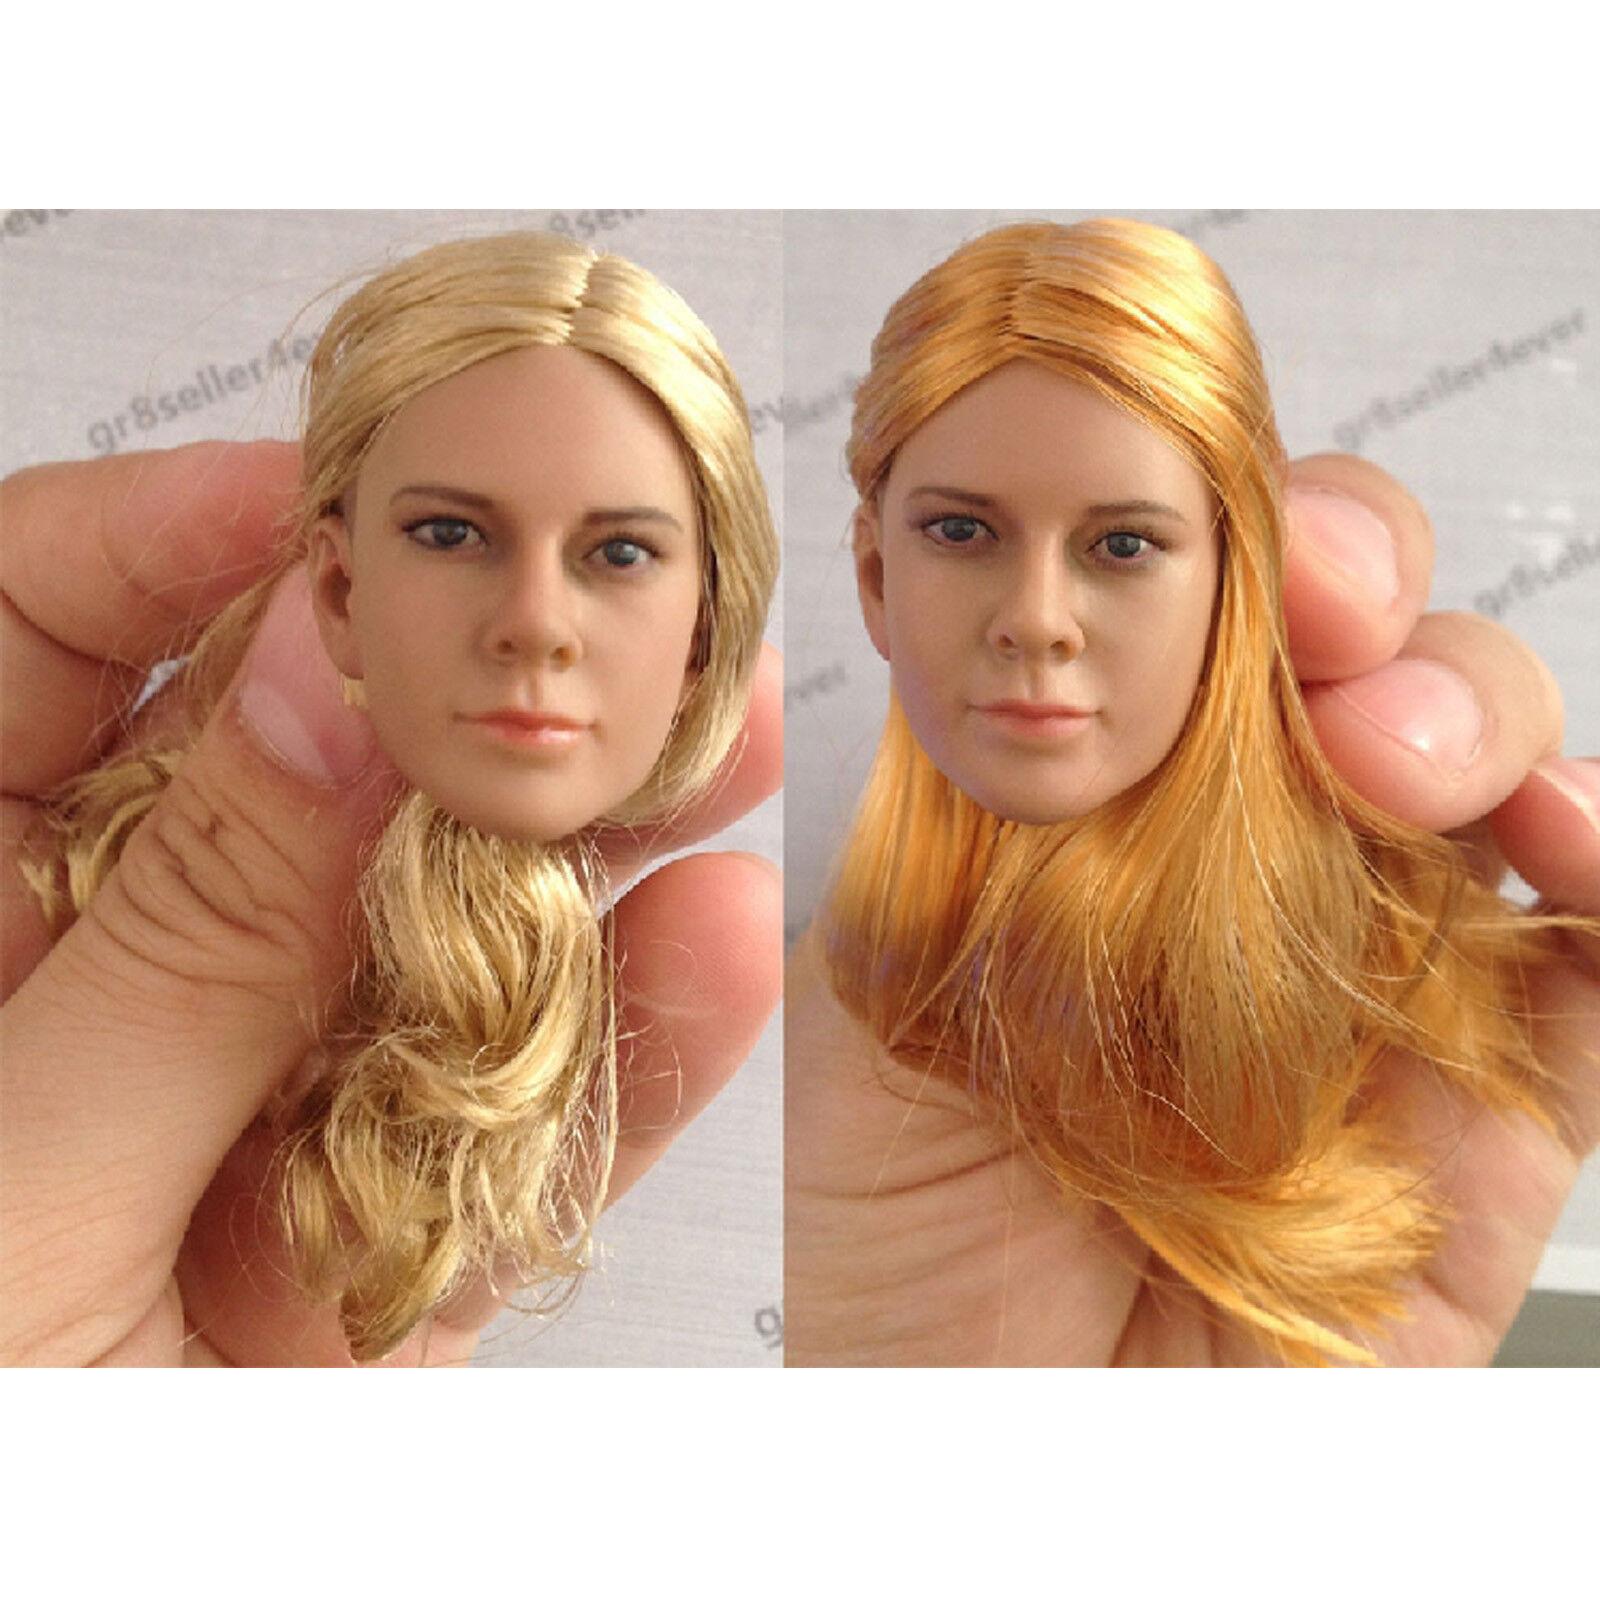 Toys D003A/B 1/6 Scale Female head Sculpt For 12